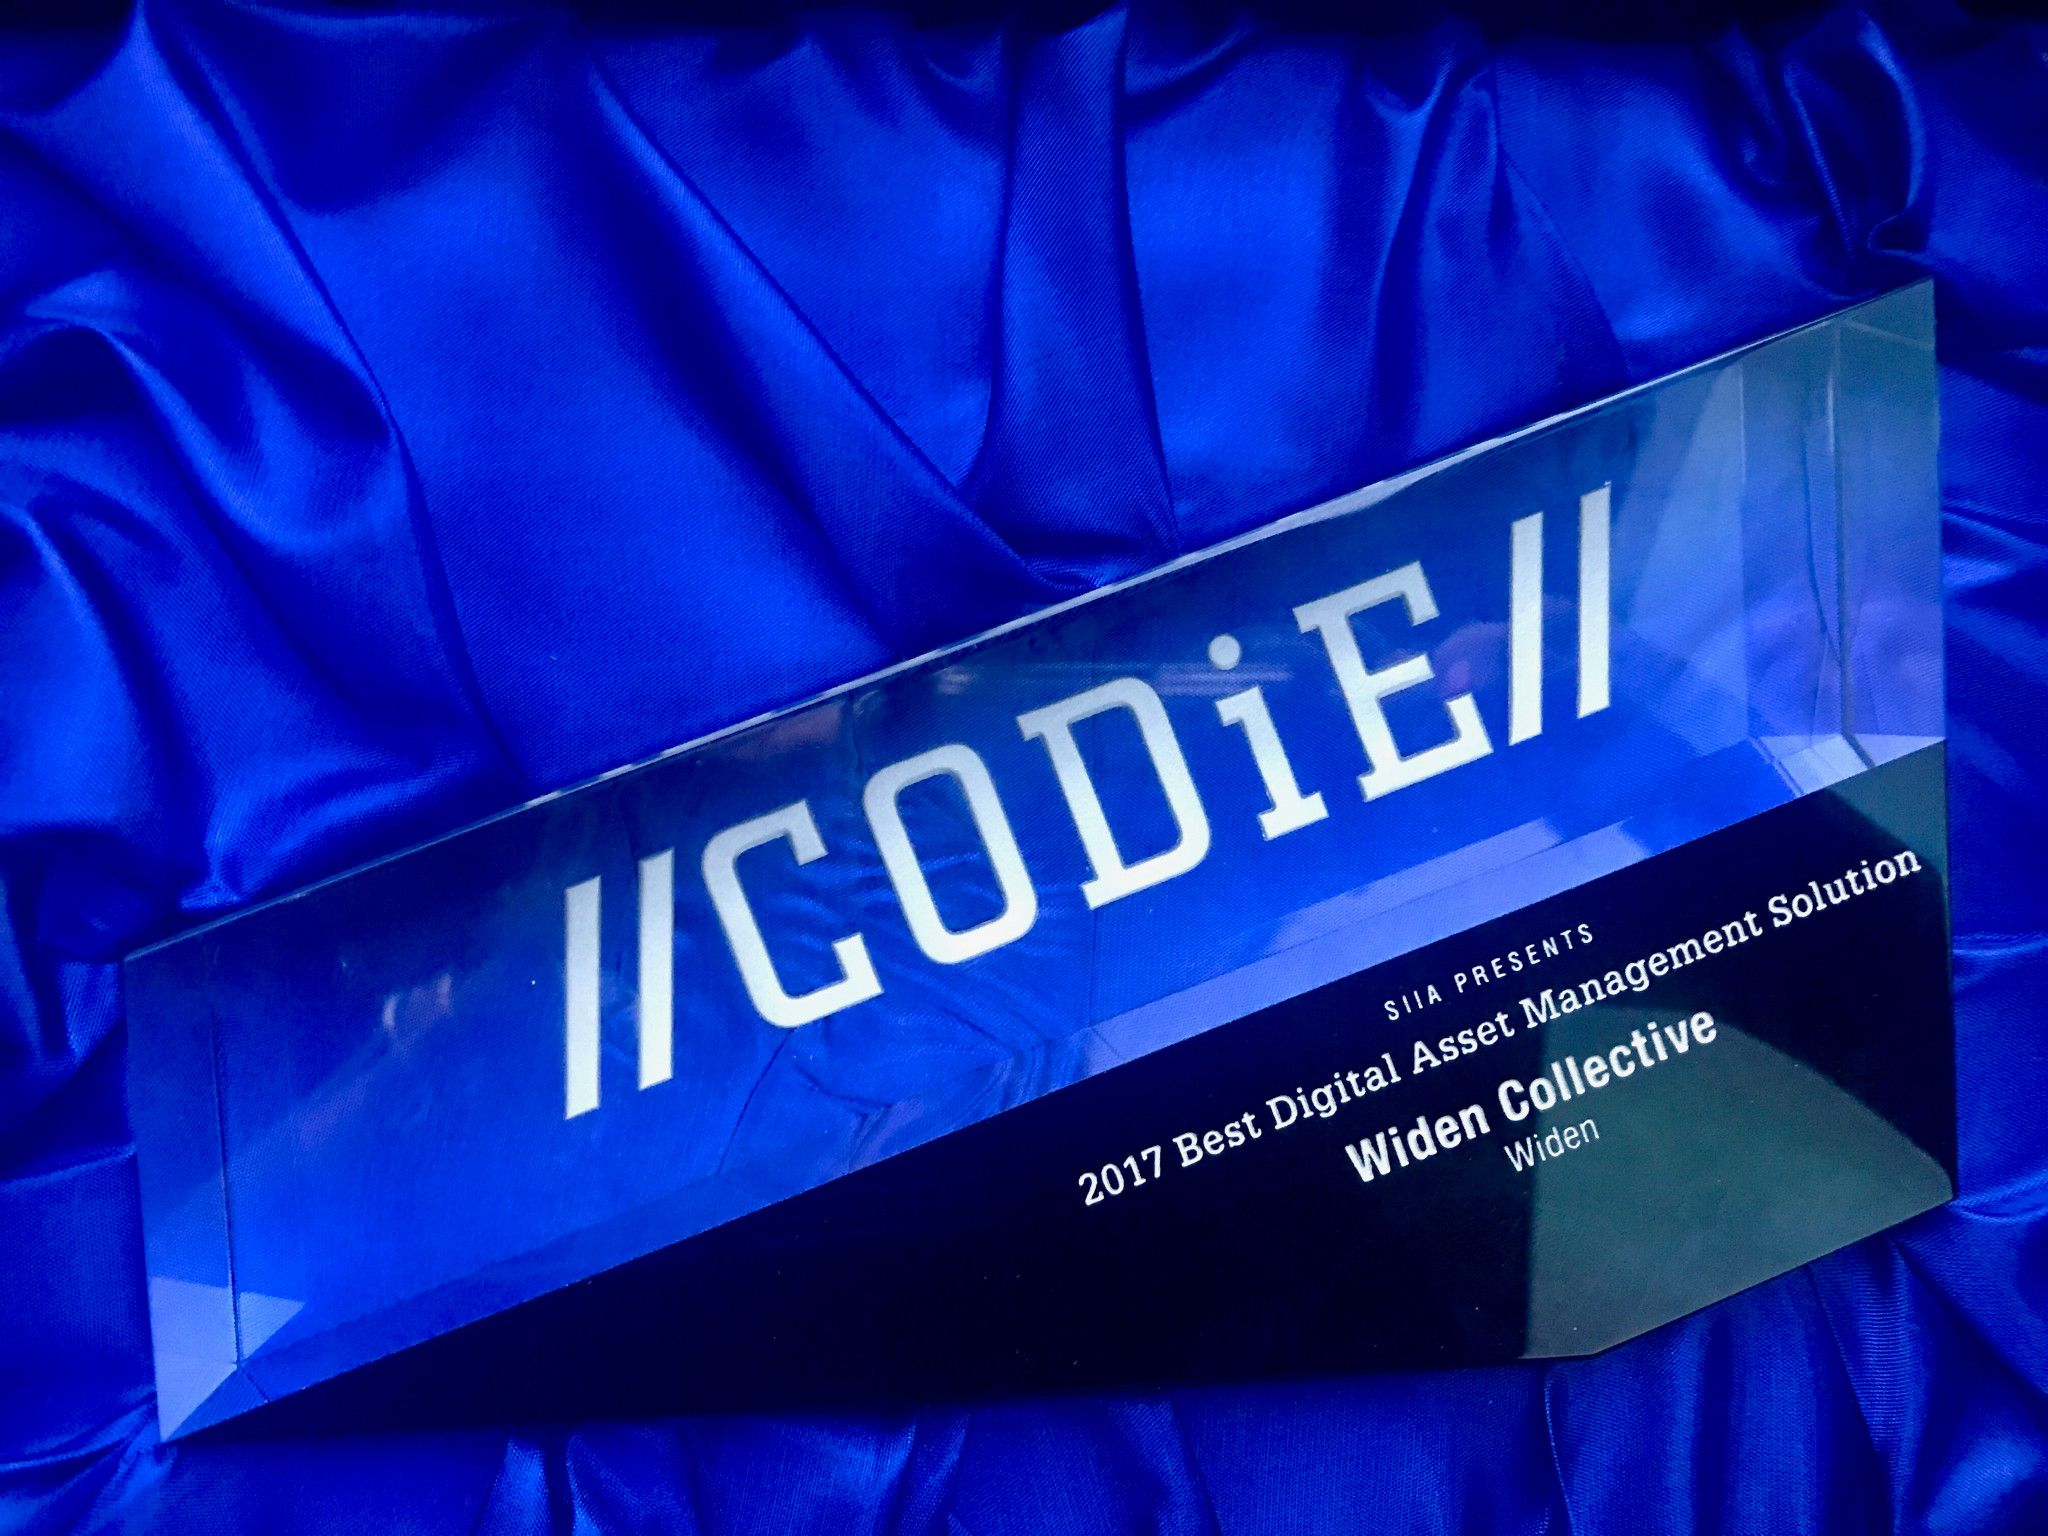 Best Digital Asset Management Solution Award